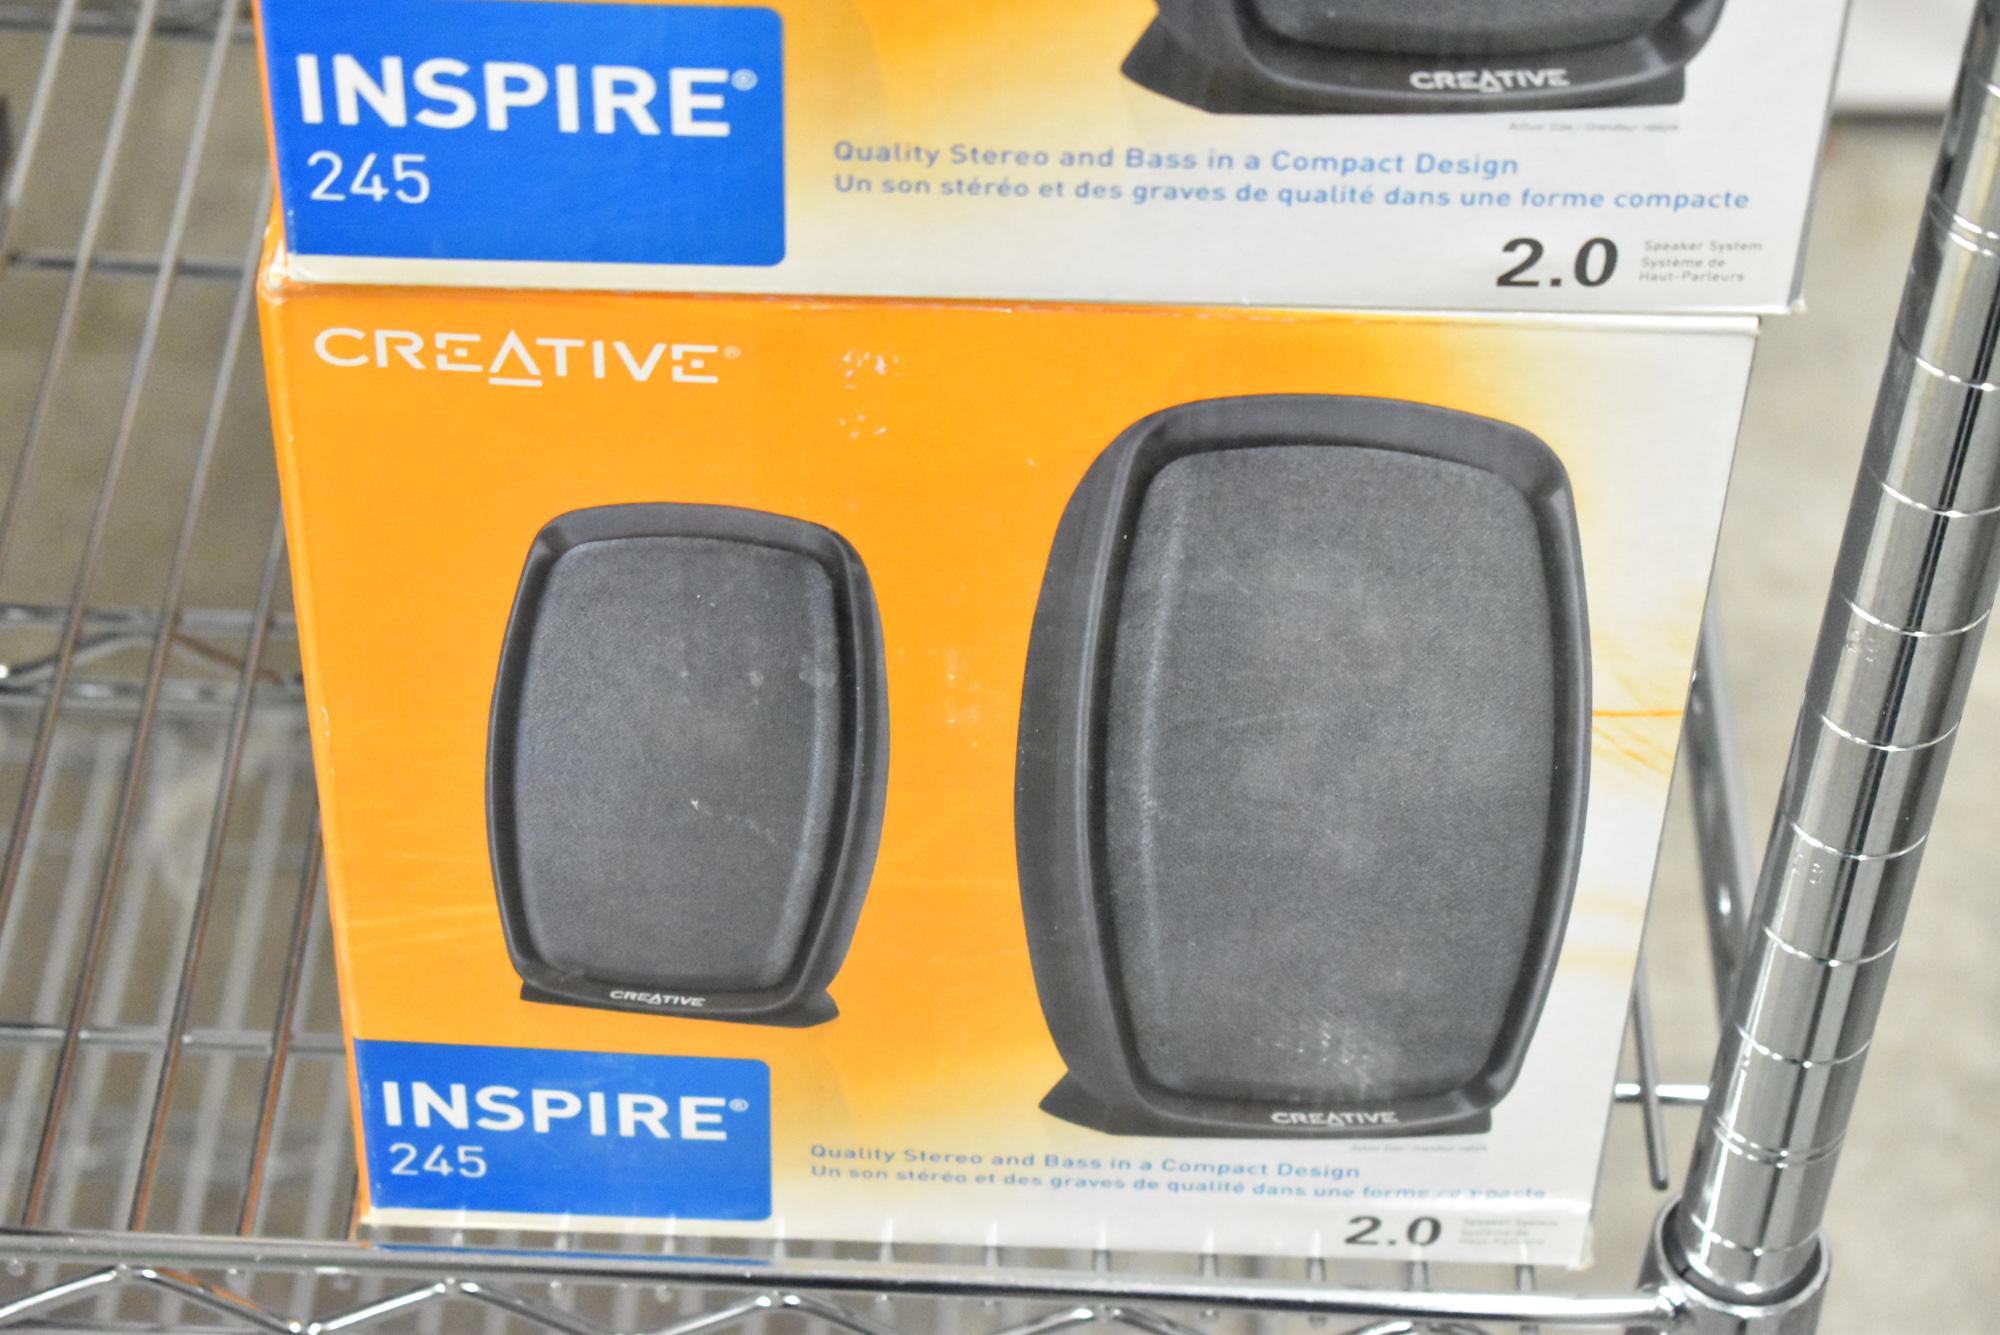 LOT/ (12) INSPIRE 245 2.0 DESKTOP COMPUTER SPEAKER SETS [$10 USD OPTIONAL LOADING FEE - CONTACT - Image 2 of 2